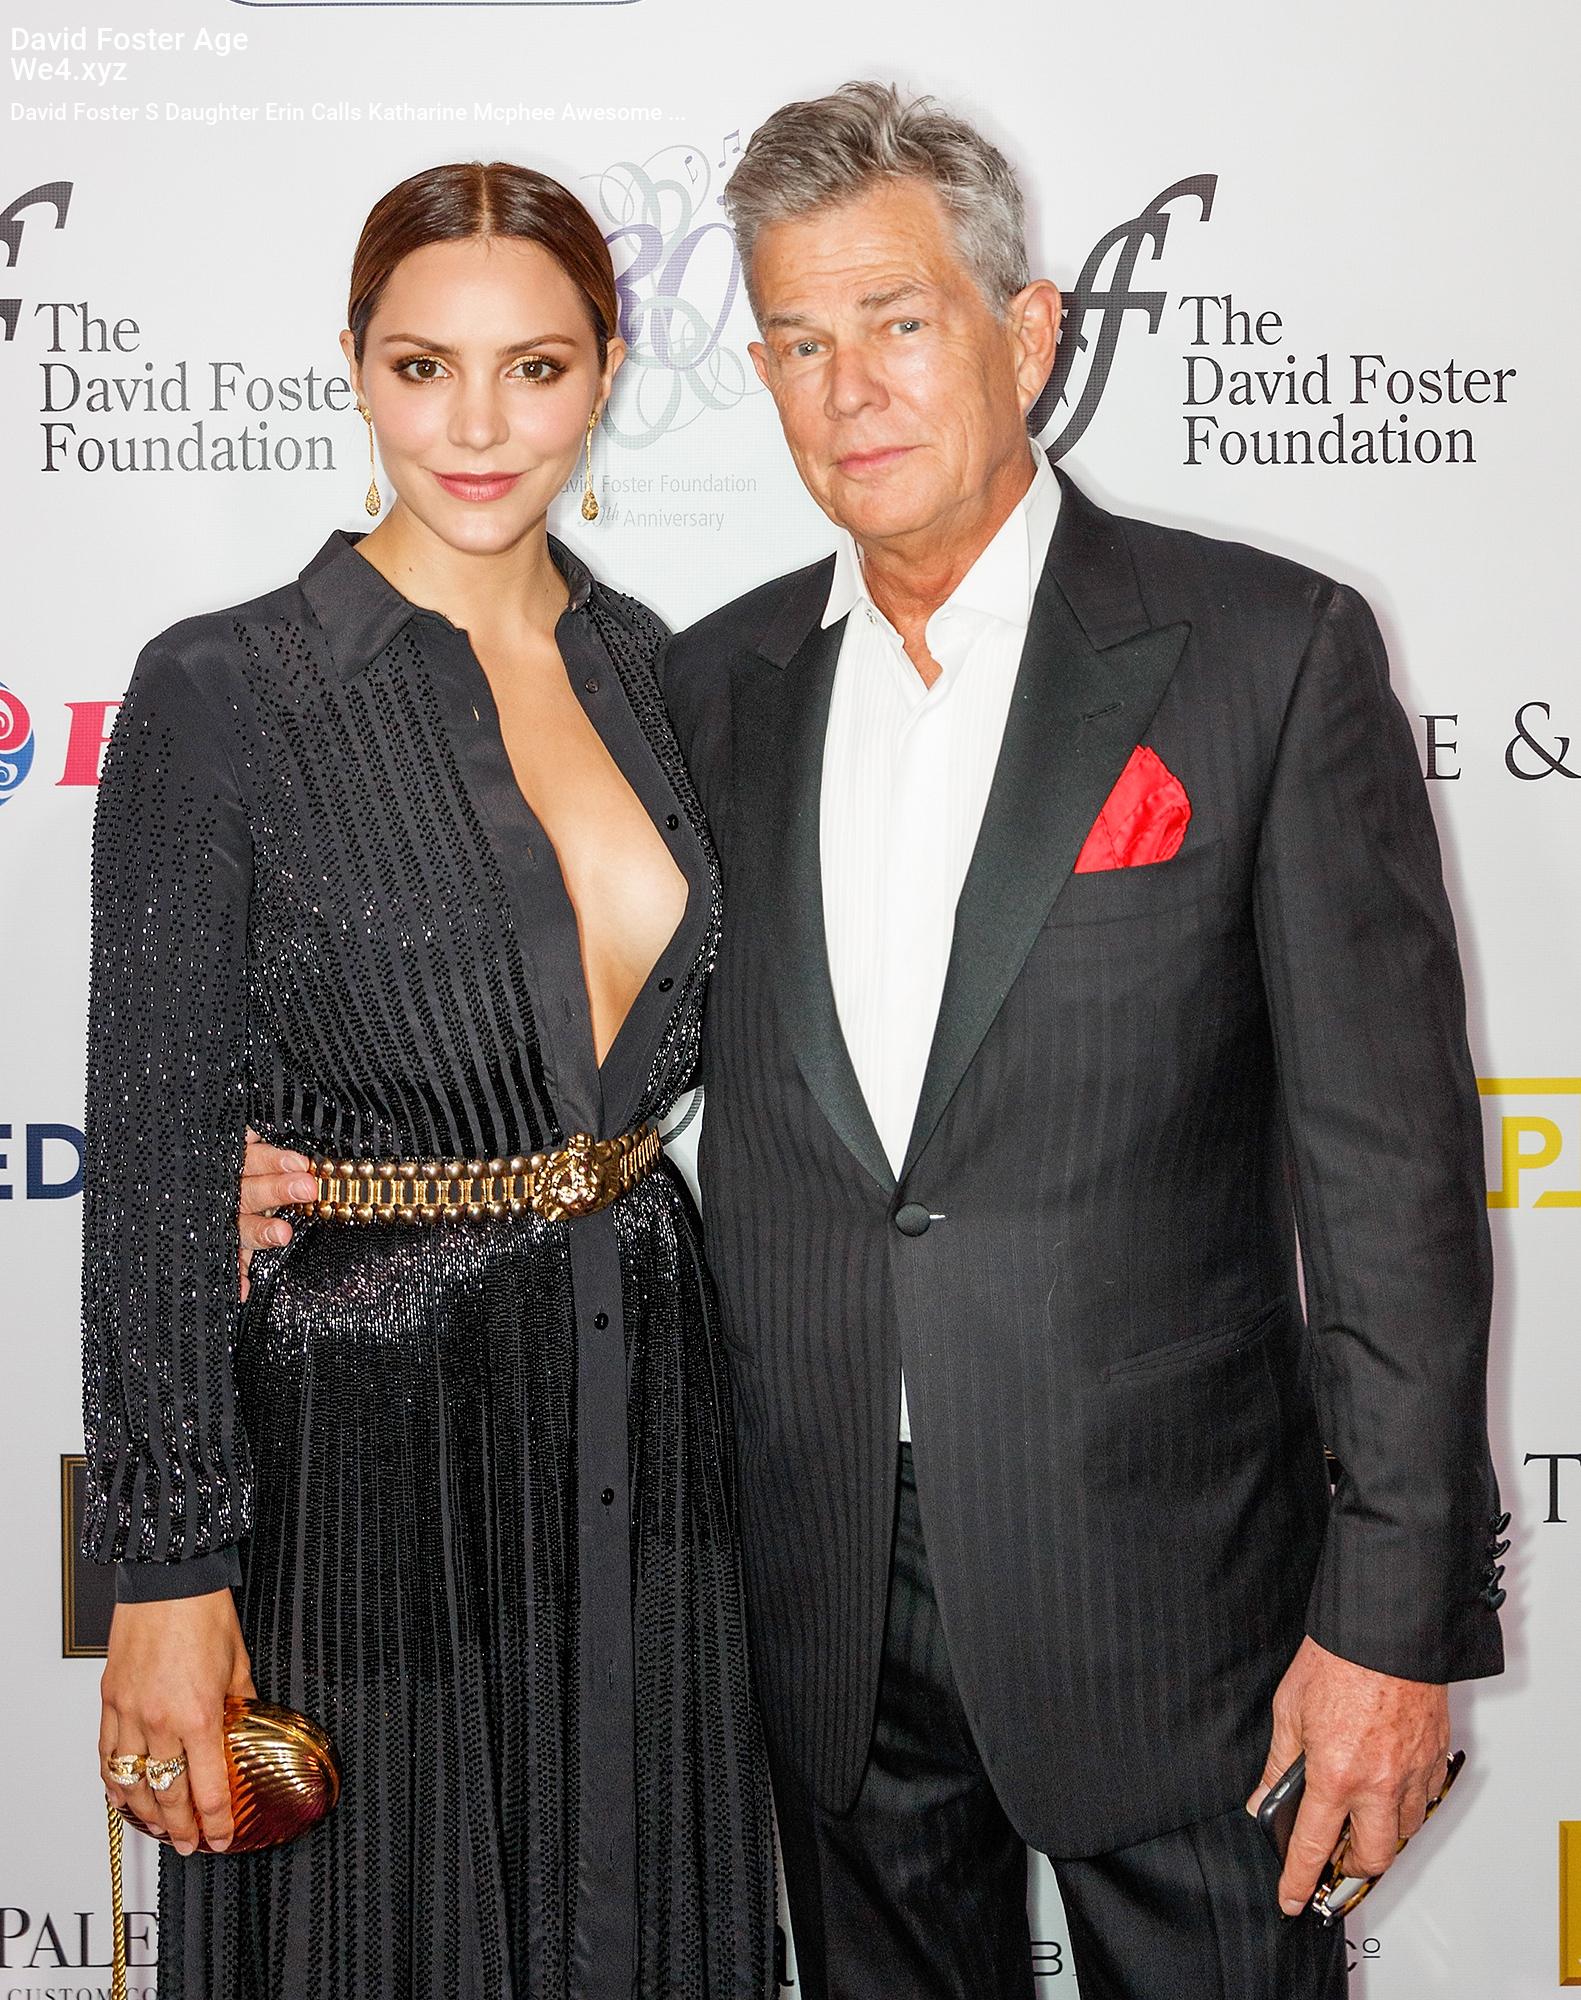 David Foster Age Cute Celebrity Couples Celebrity Couples David Foster Daughters